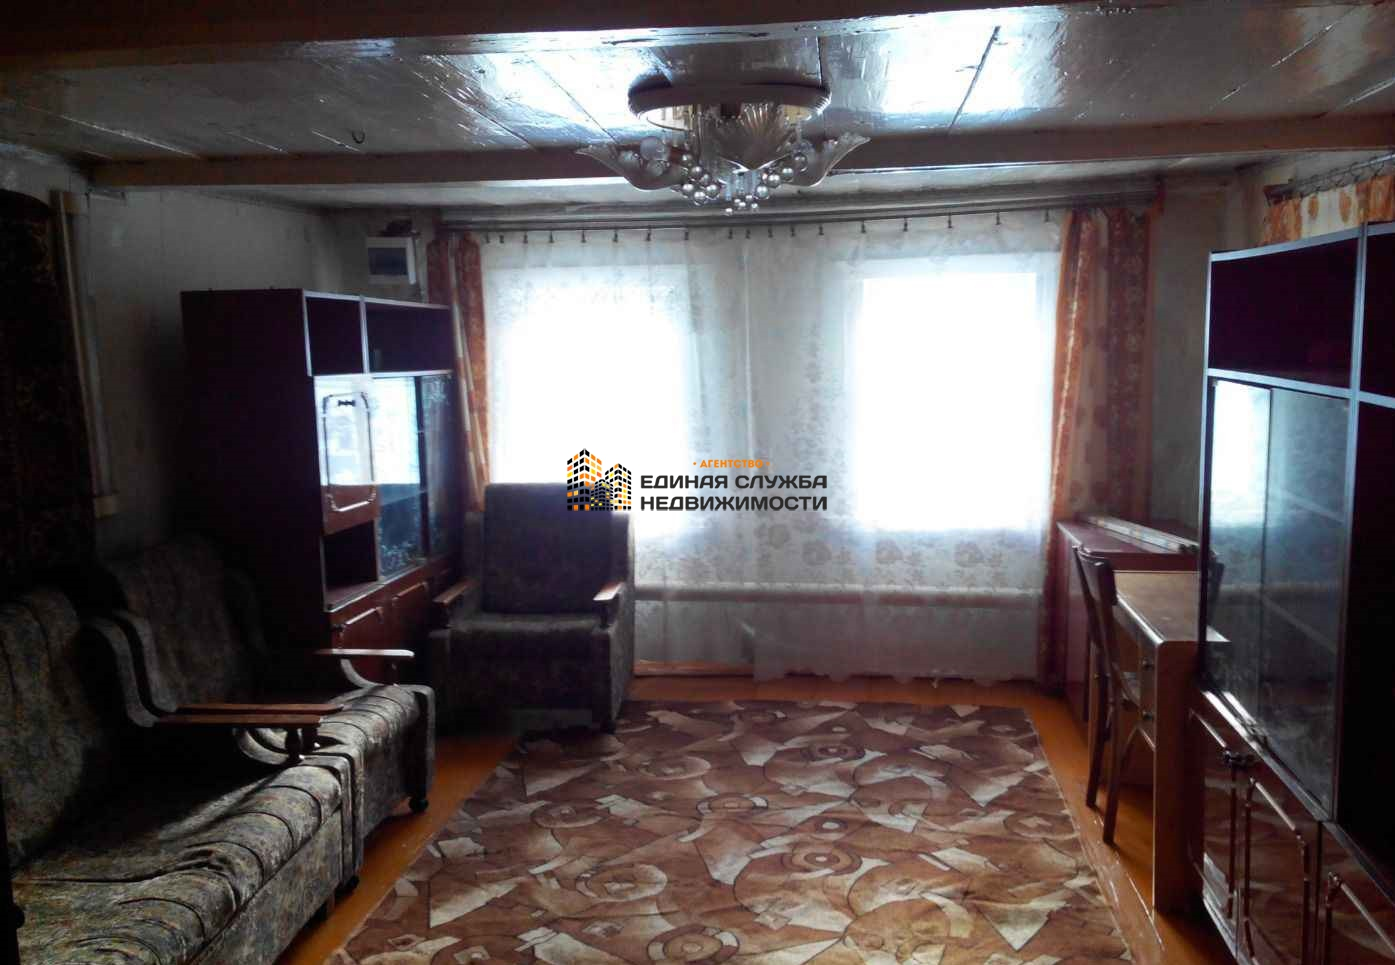 http://ufabez.ru/uploads/baza/files/28659414d_1400x1050_689909738_orig.jpg